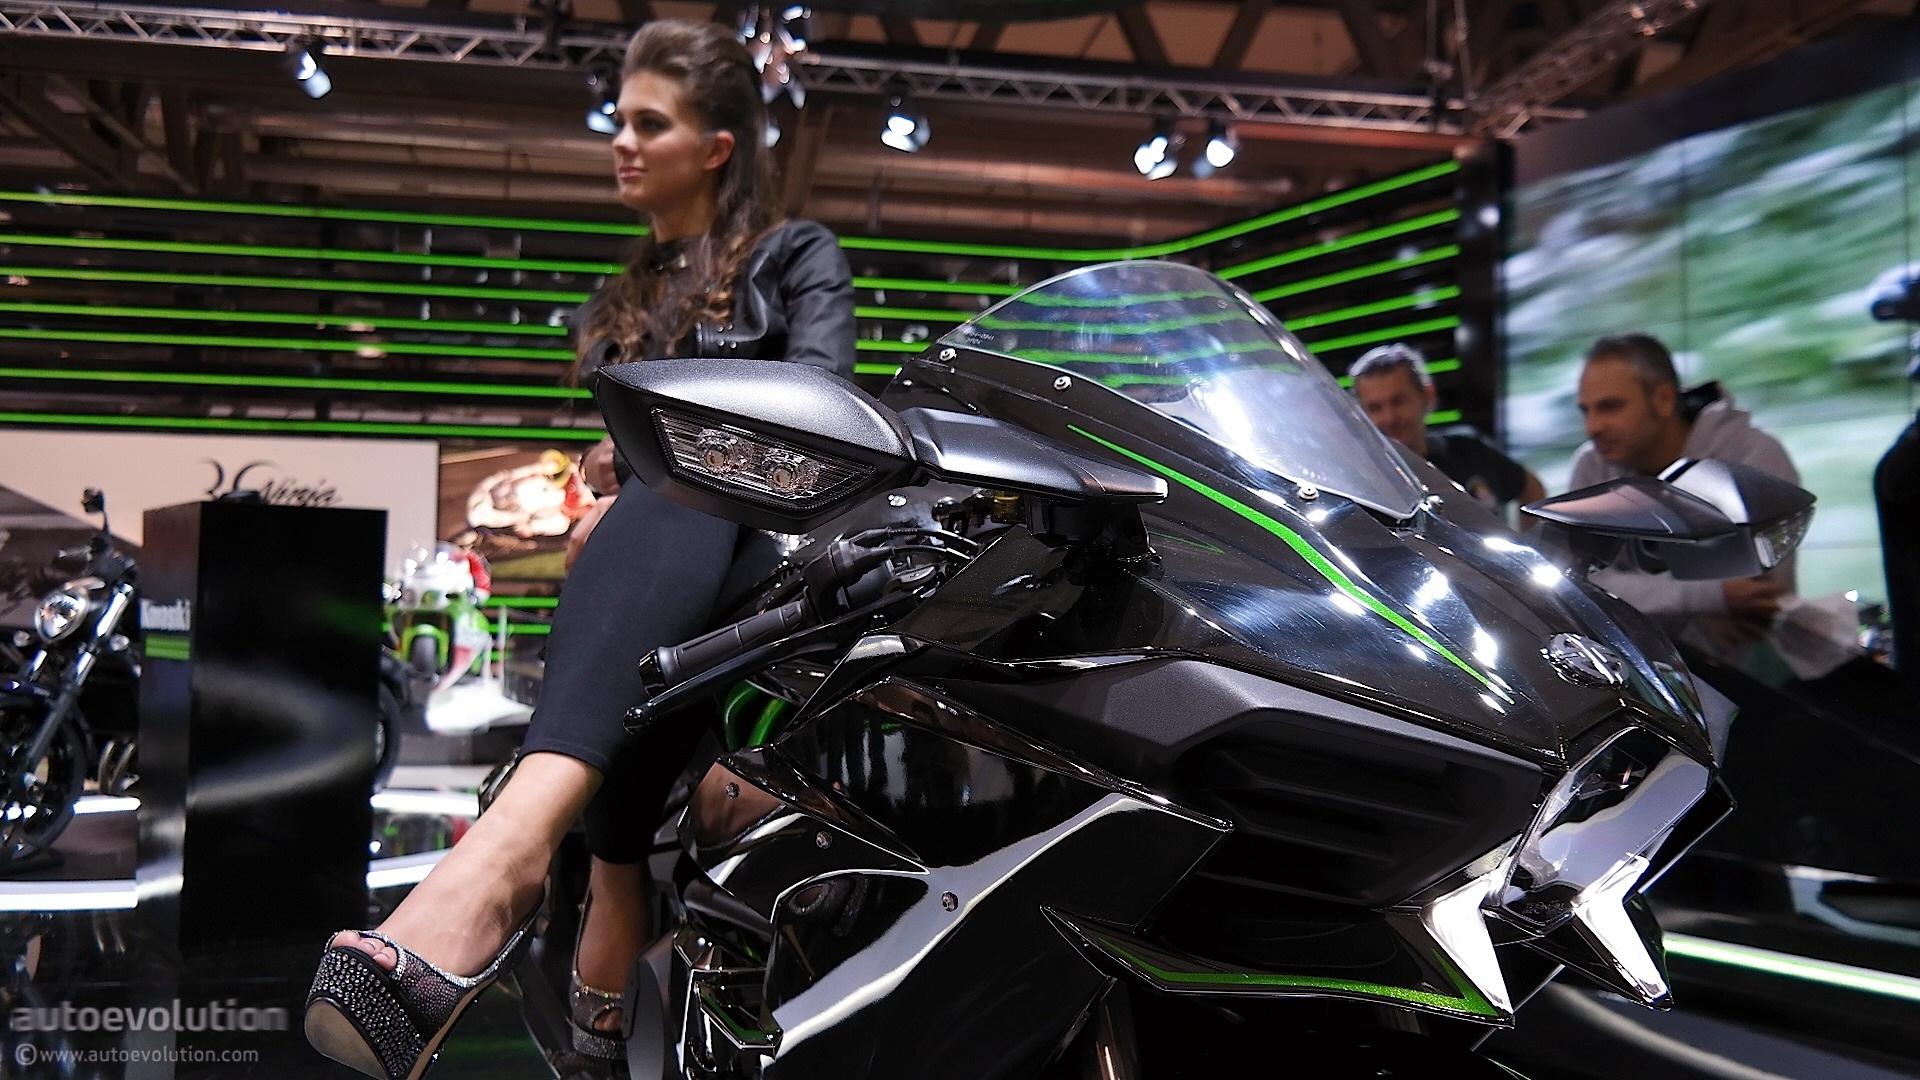 Monster Energy Girls Wallpaper Hd Kawasaki Ninja H2 Goes To India Price Doubles Autoevolution